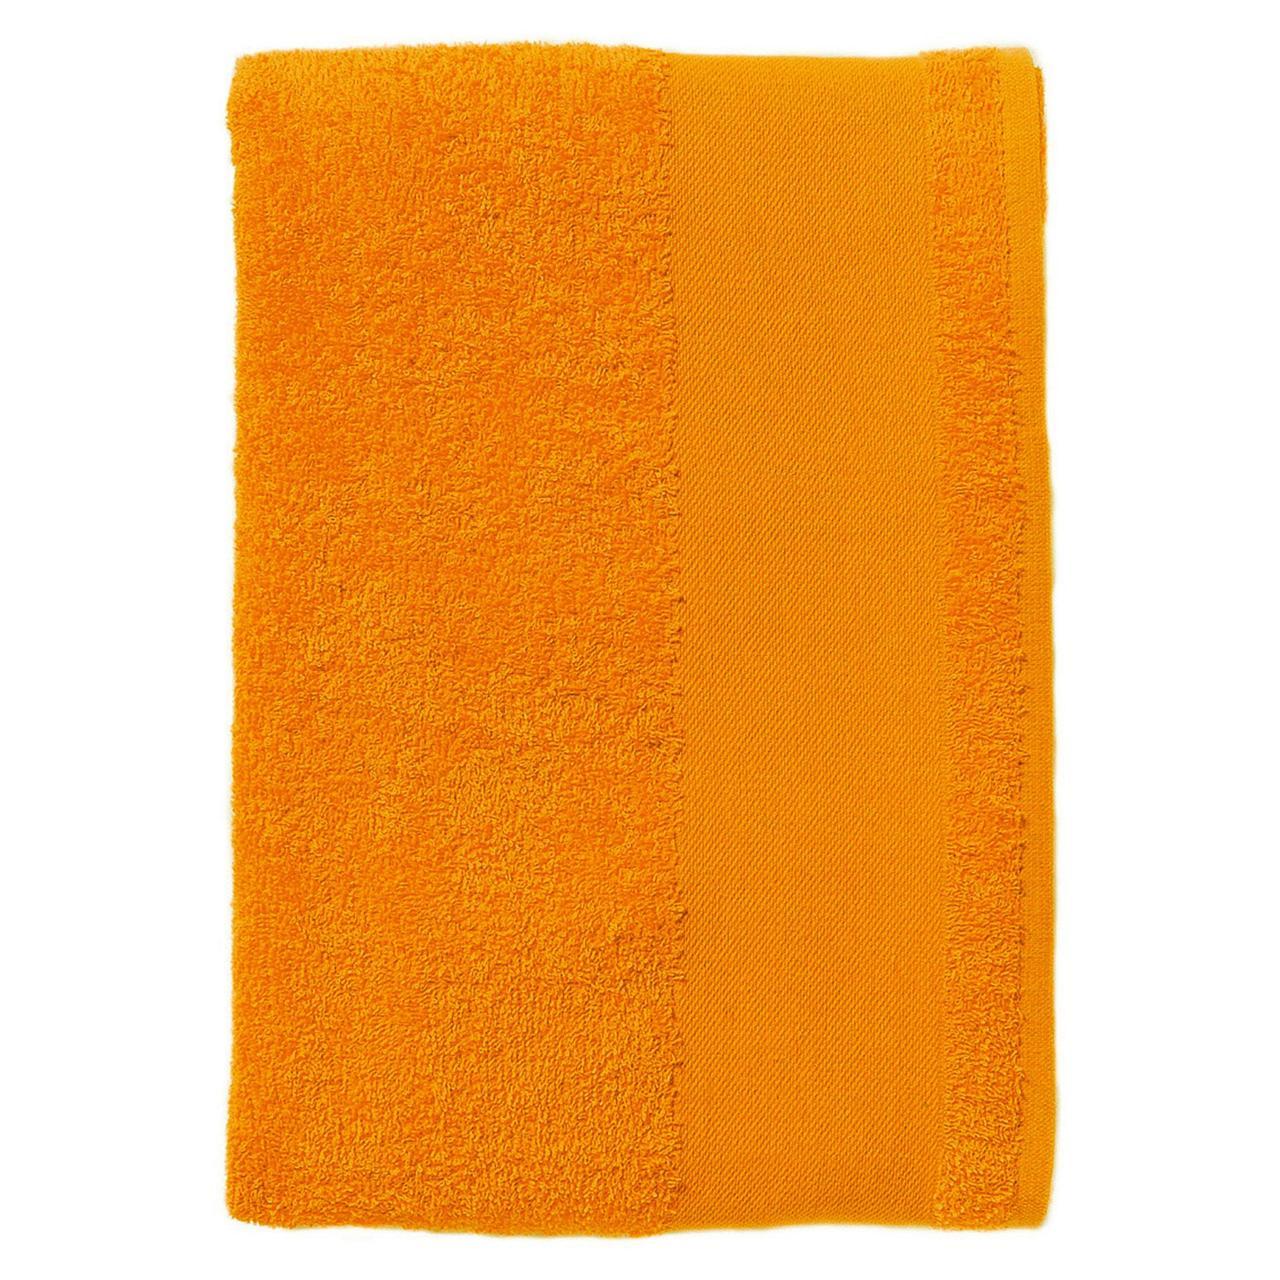 Полотенце махровое Island Medium, оранжевое (артикул 4592.20)